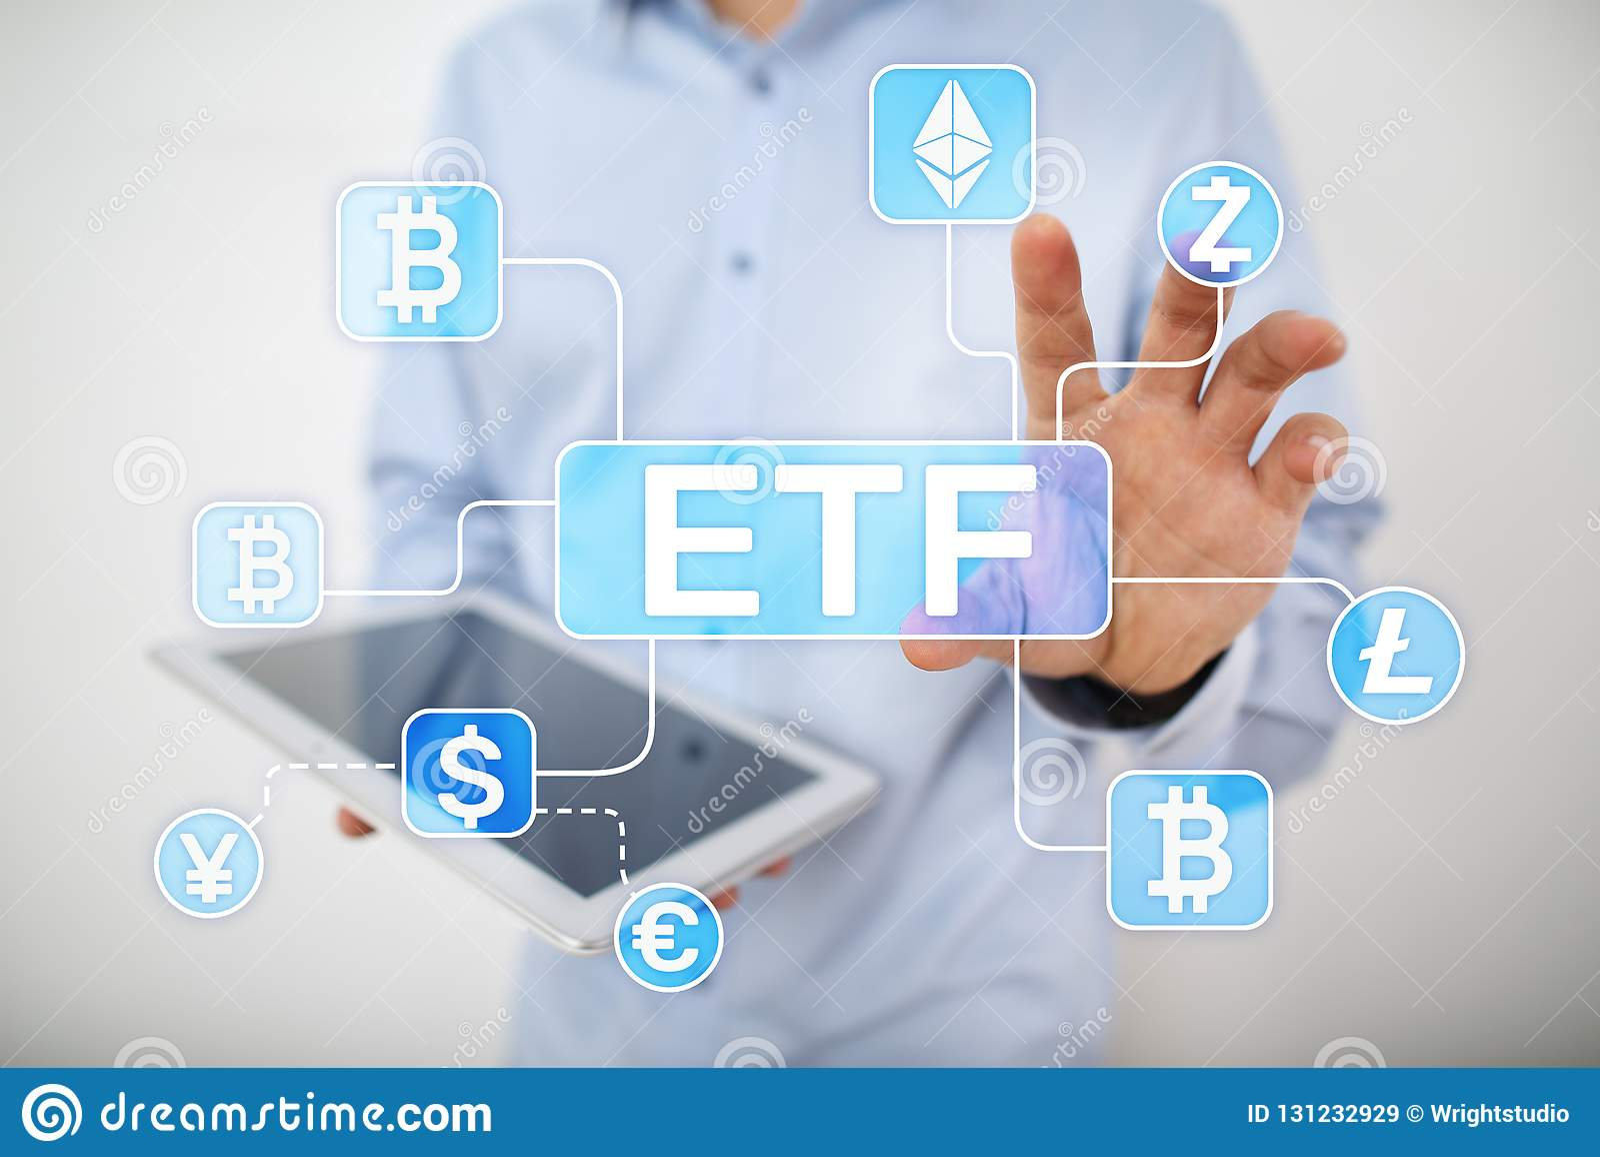 Bitcoin ETF 交换在虚屏上的被换的资金和cryptocurrency概念